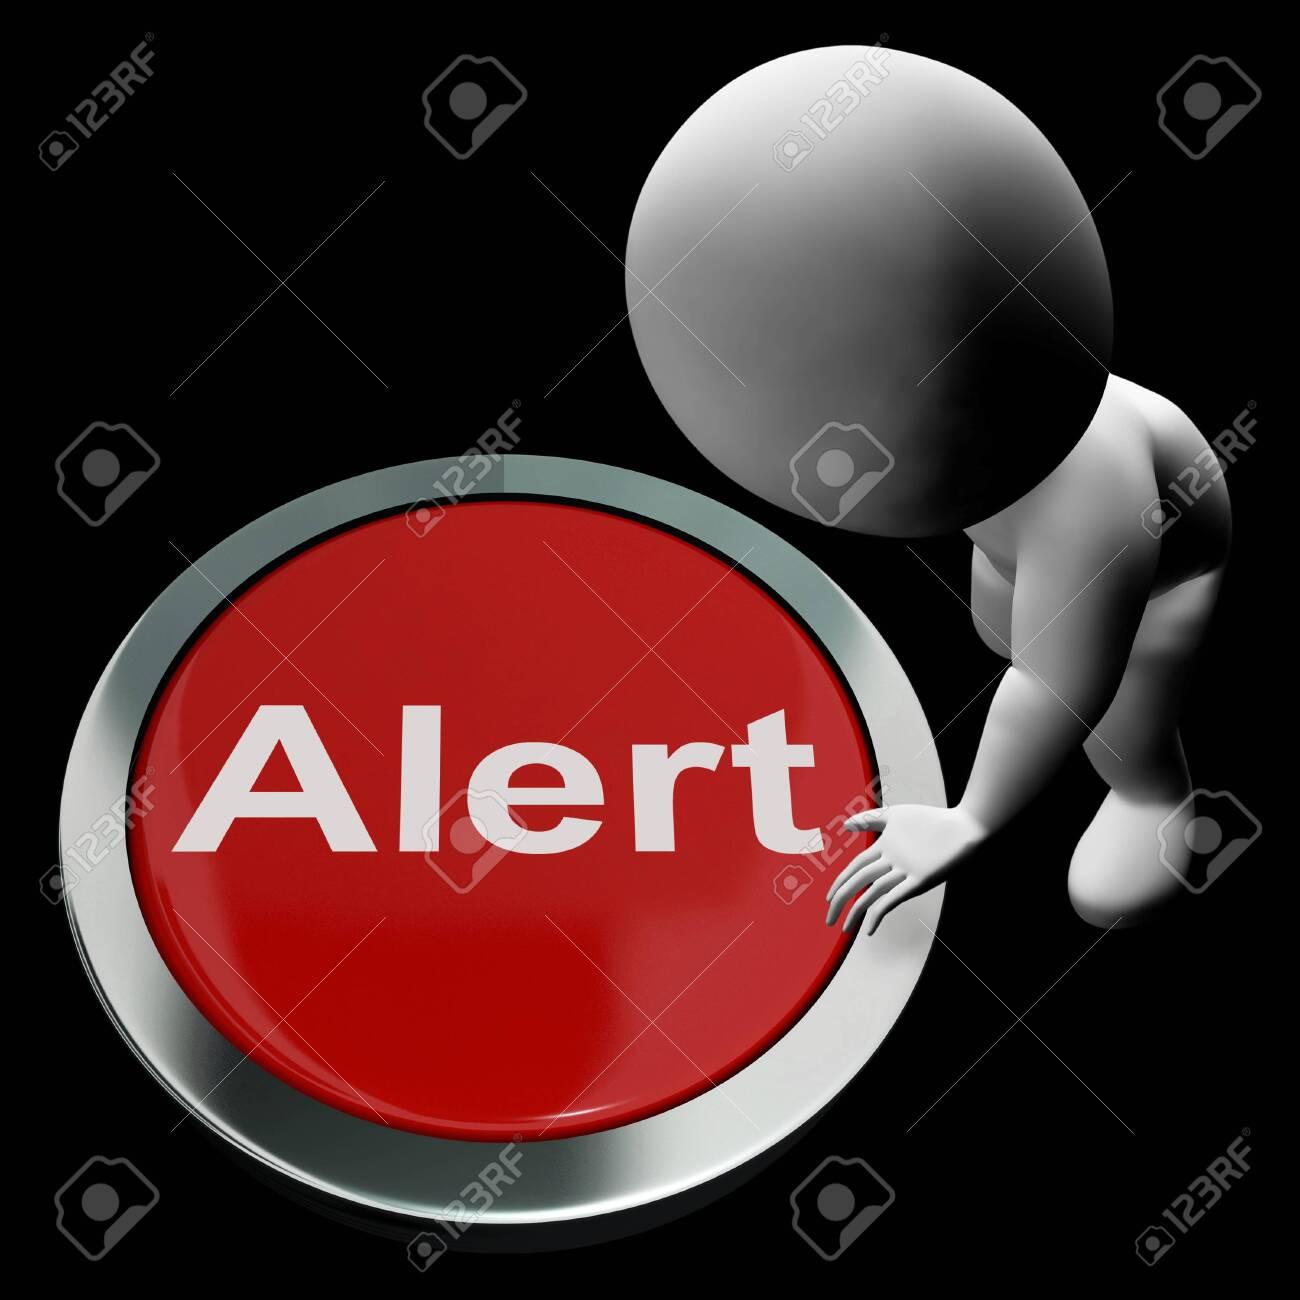 Alert Button Showing Warn Caution Or Raise Alarm Stock Photo - 26235135